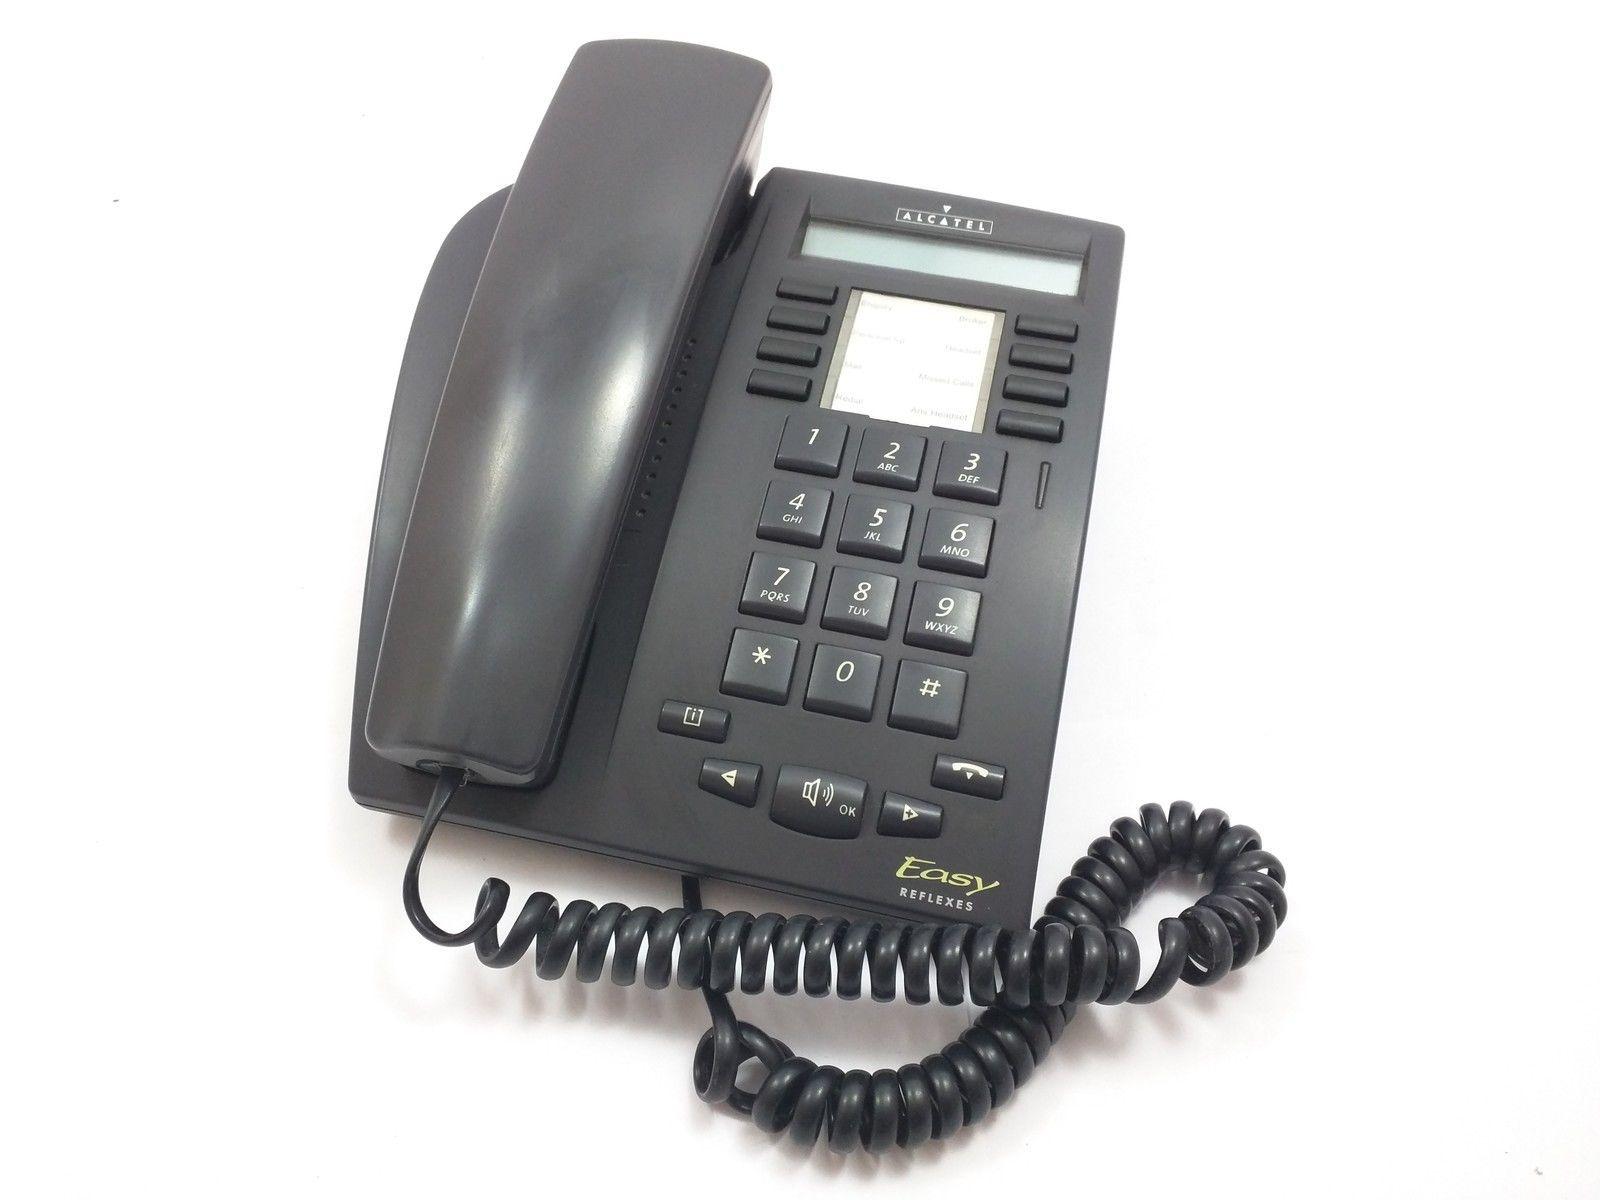 Alcatel-Lucent 4010 Easy Tischtelefon refurbished